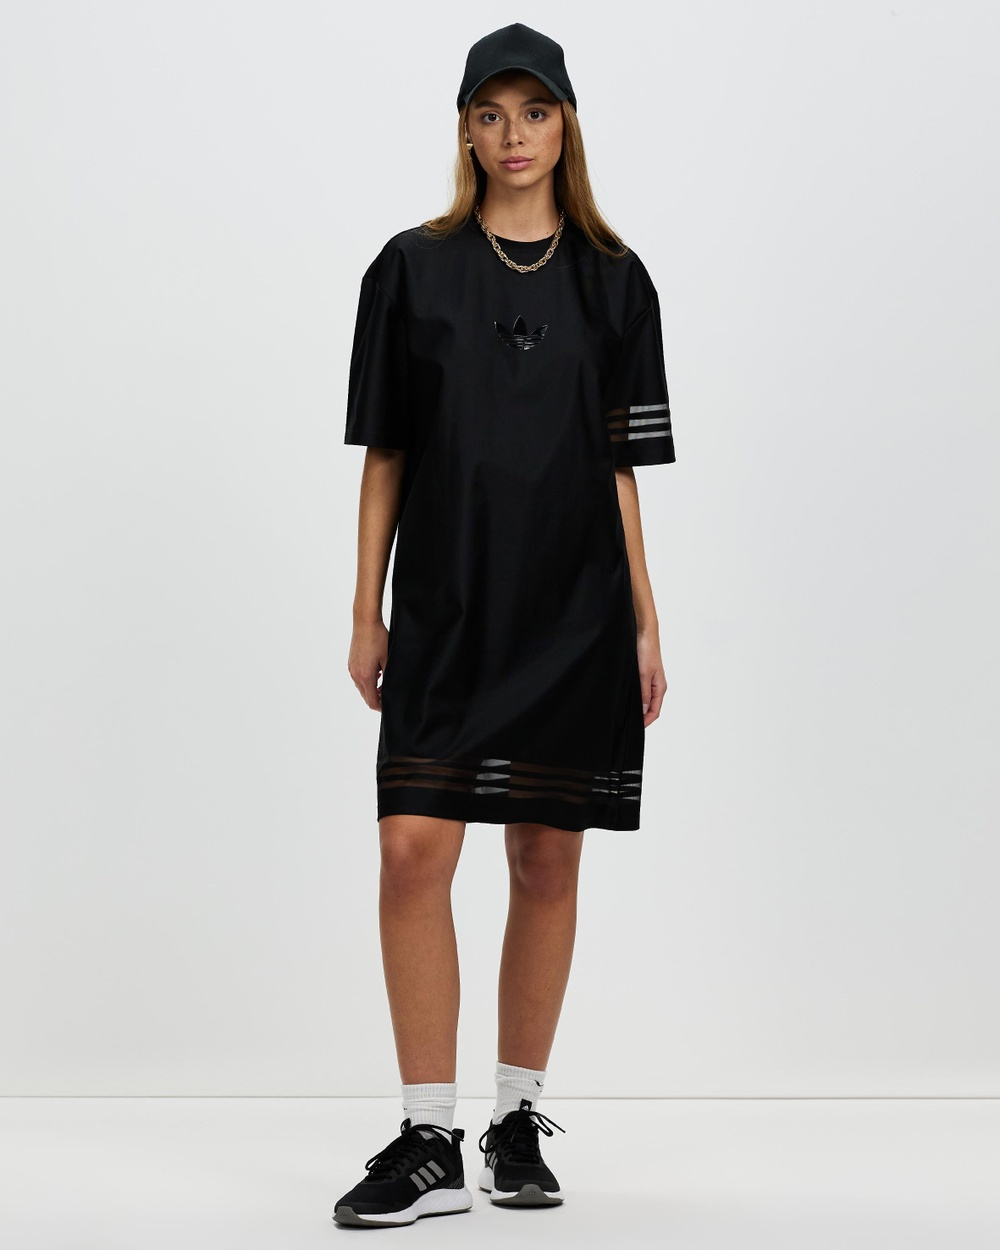 adidas Originals Tee Dress Dresses Black